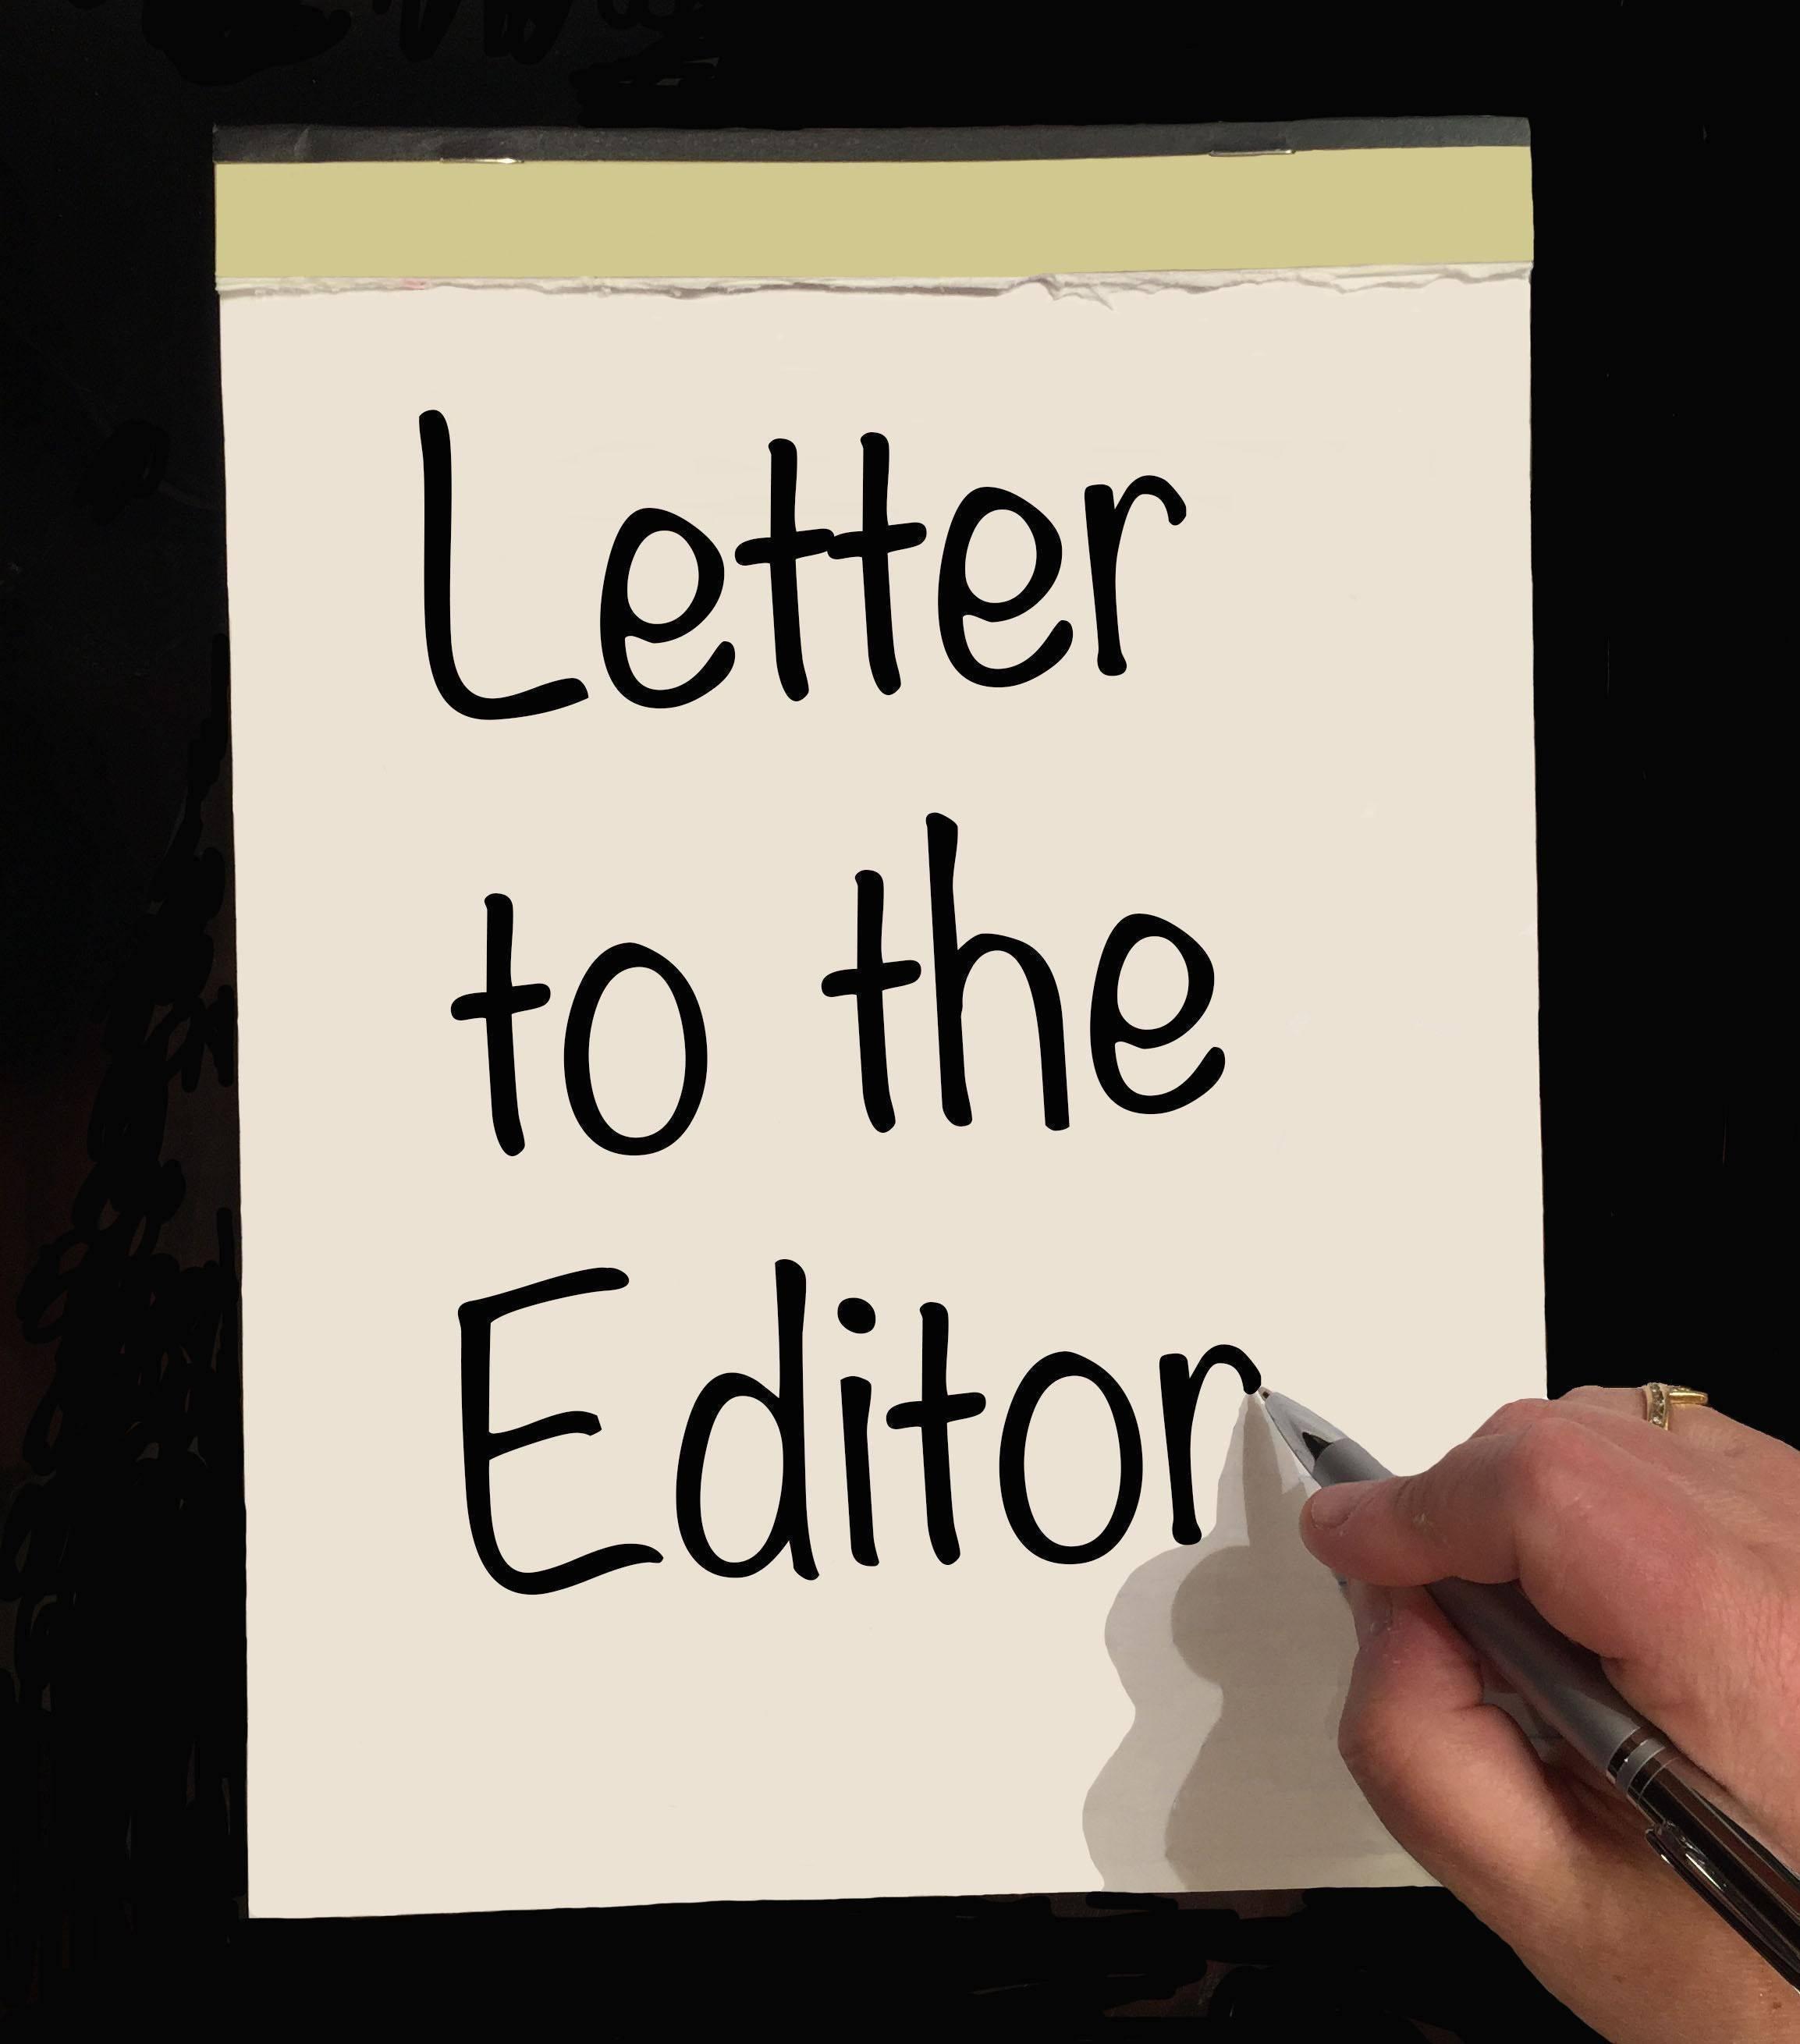 Letter: Column A Team Reflects Cranford